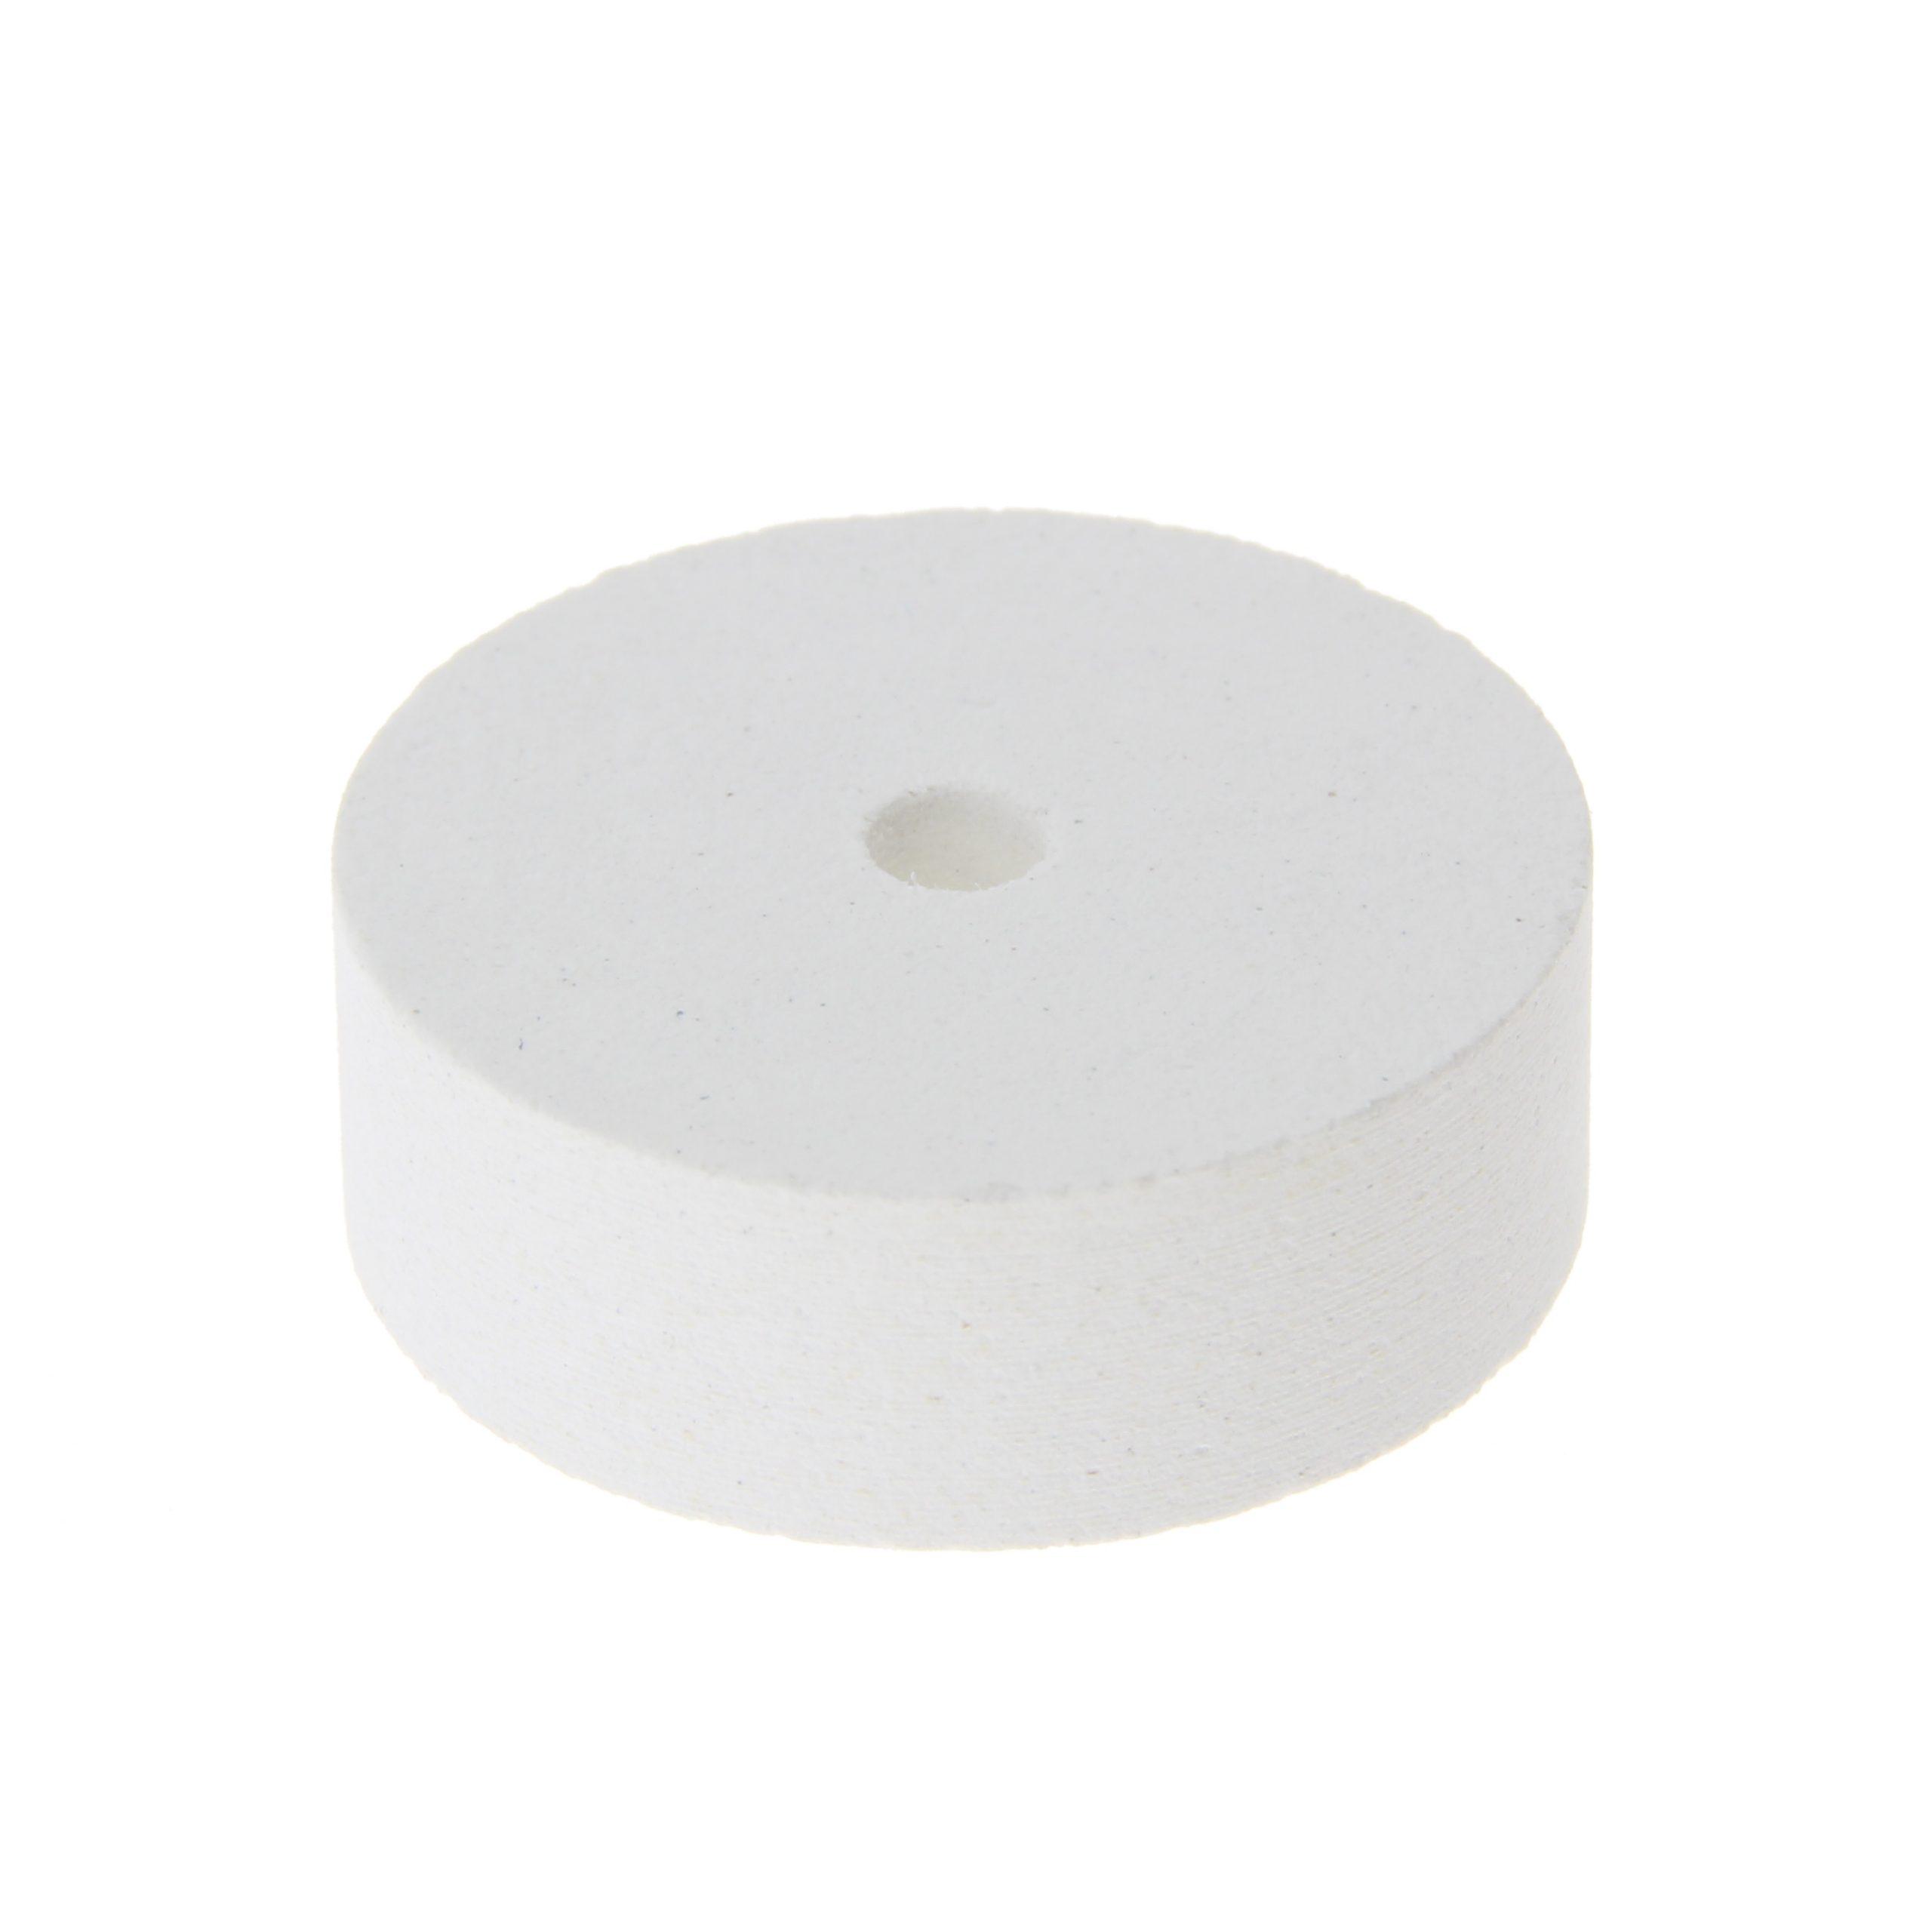 Шайба изоляционная керам. D=30mm H=10 mm